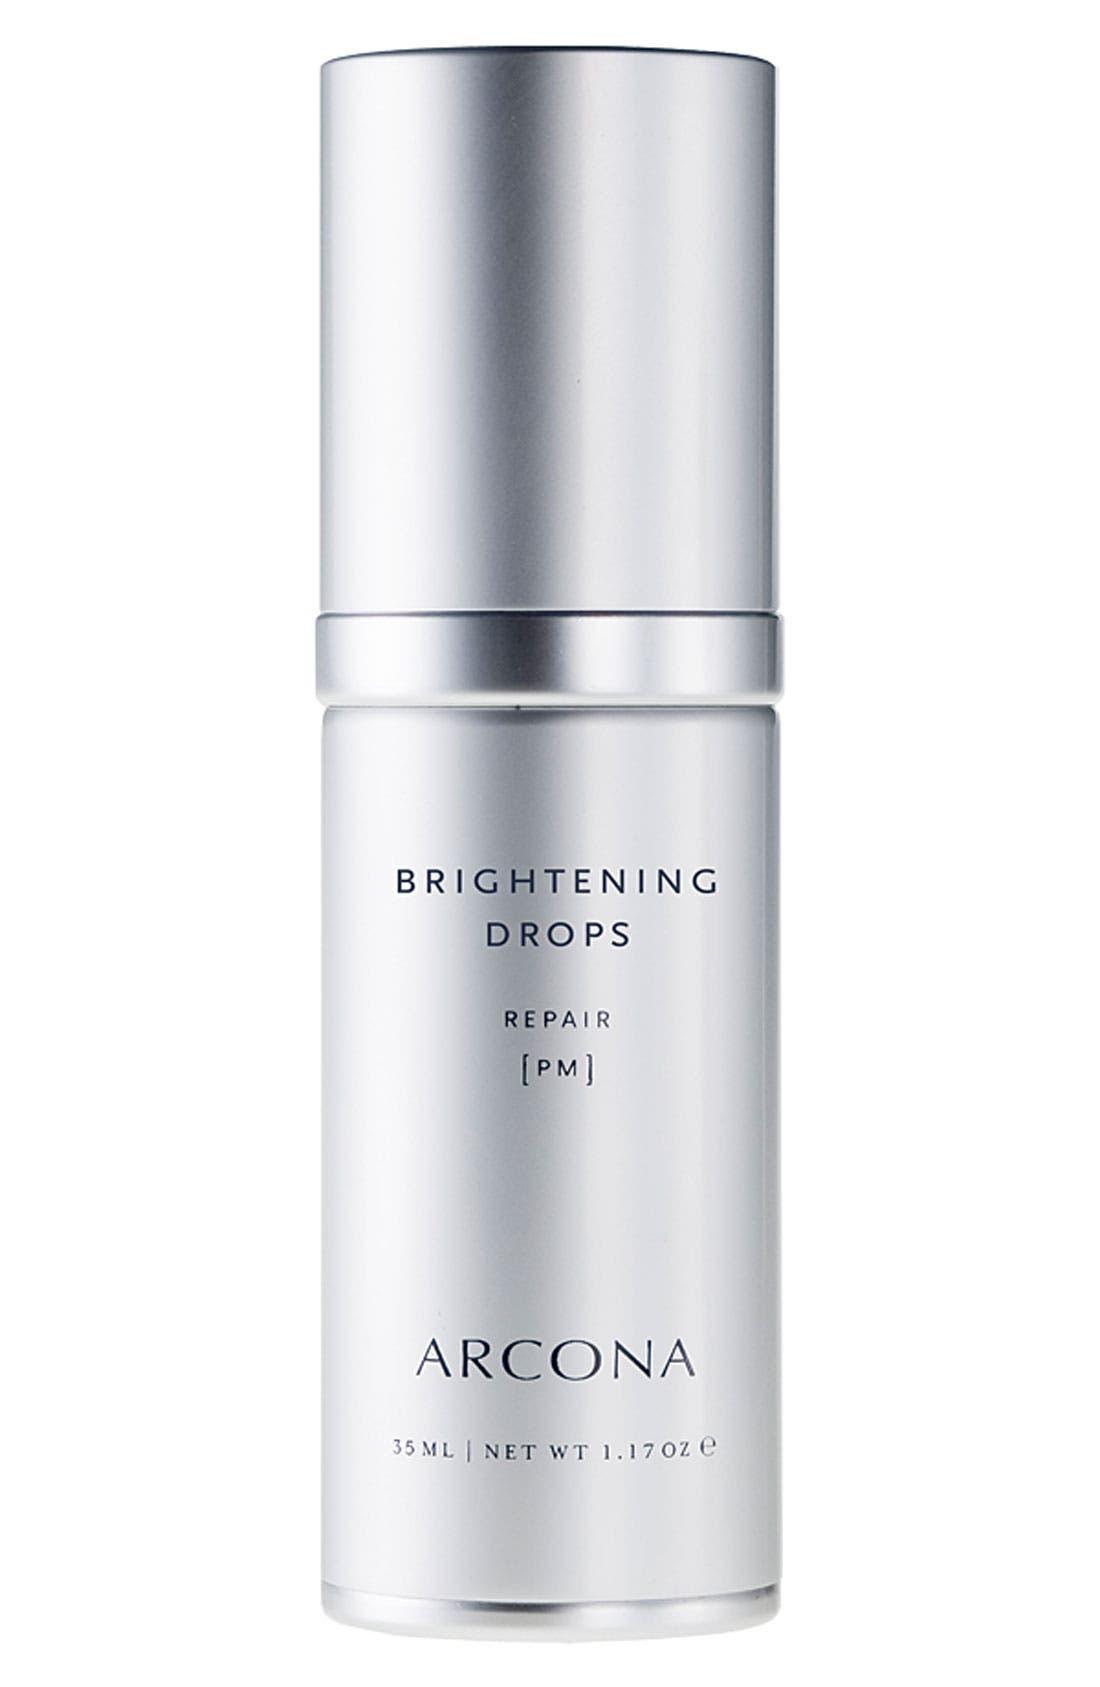 ARCONA Brightening Drops